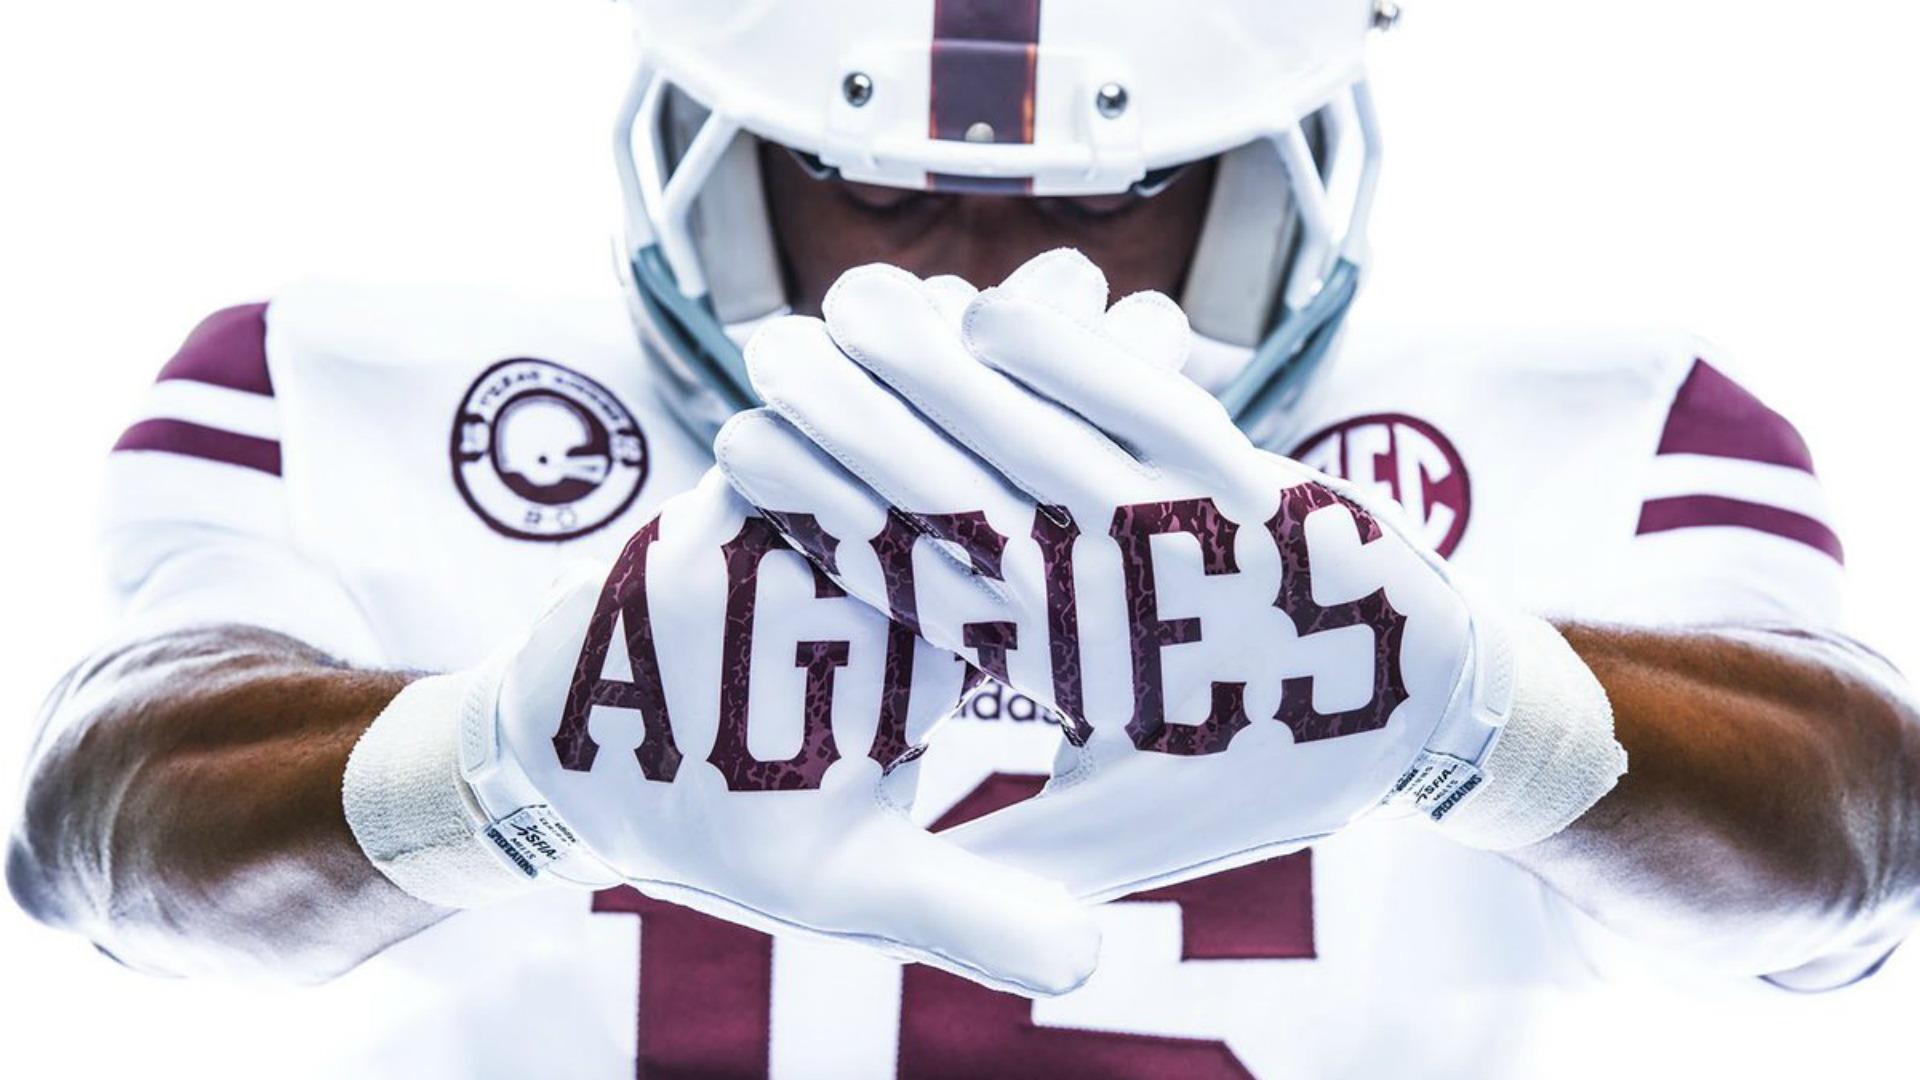 ae87b0655 Best College Football Uniforms - Week 5 - Stadium